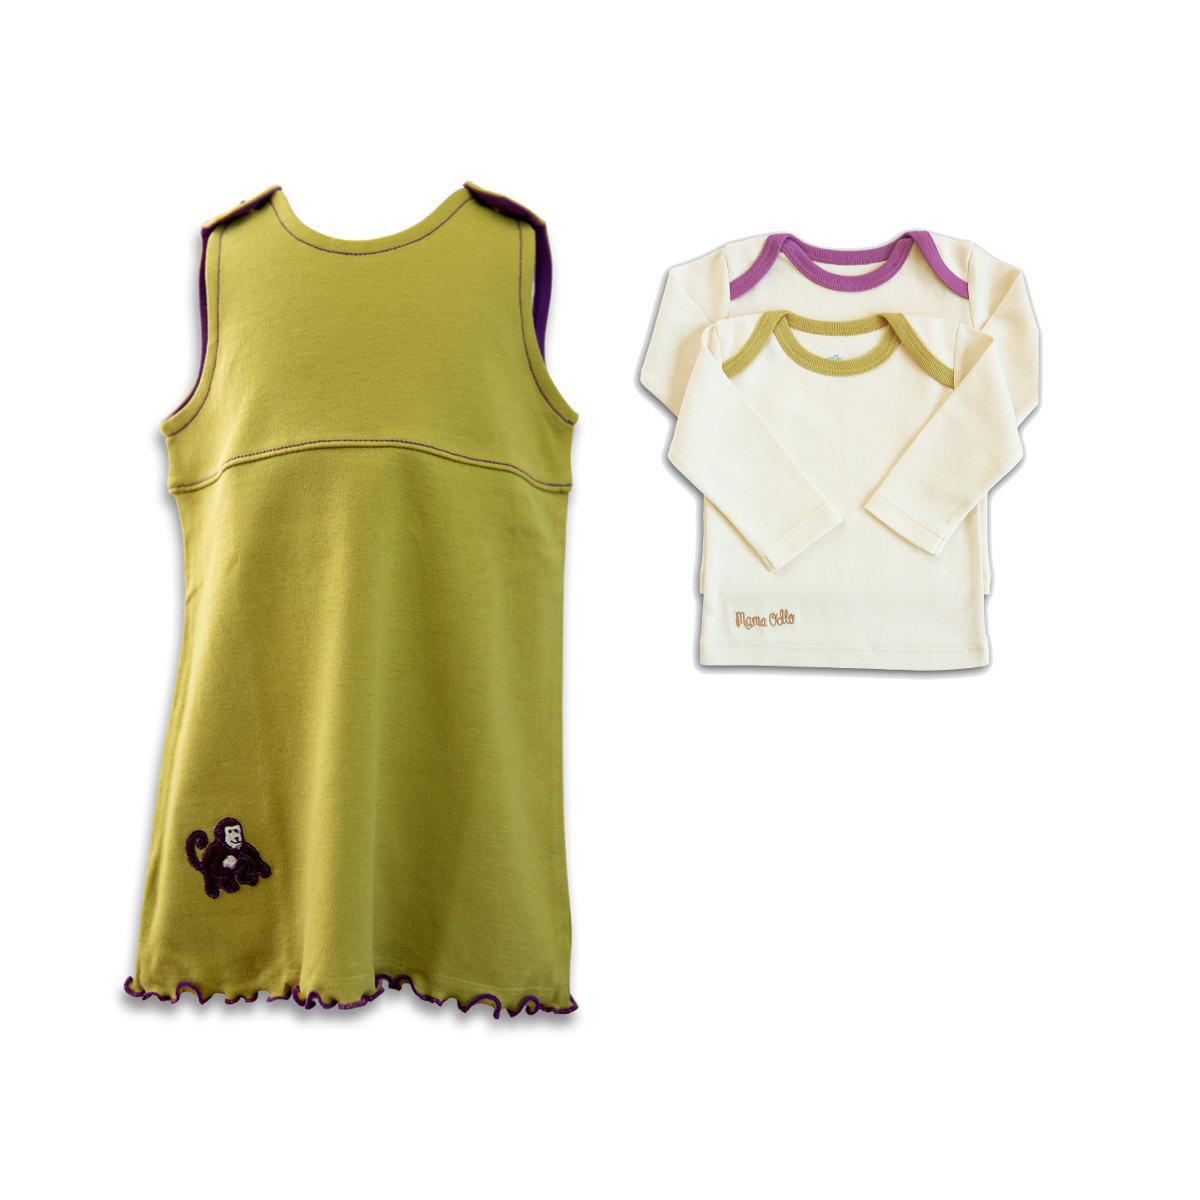 "check out ccd1b f32dc Wohlfühl-Outfit ""Affe"": grünes Kleid/Tunika u. Shirt"